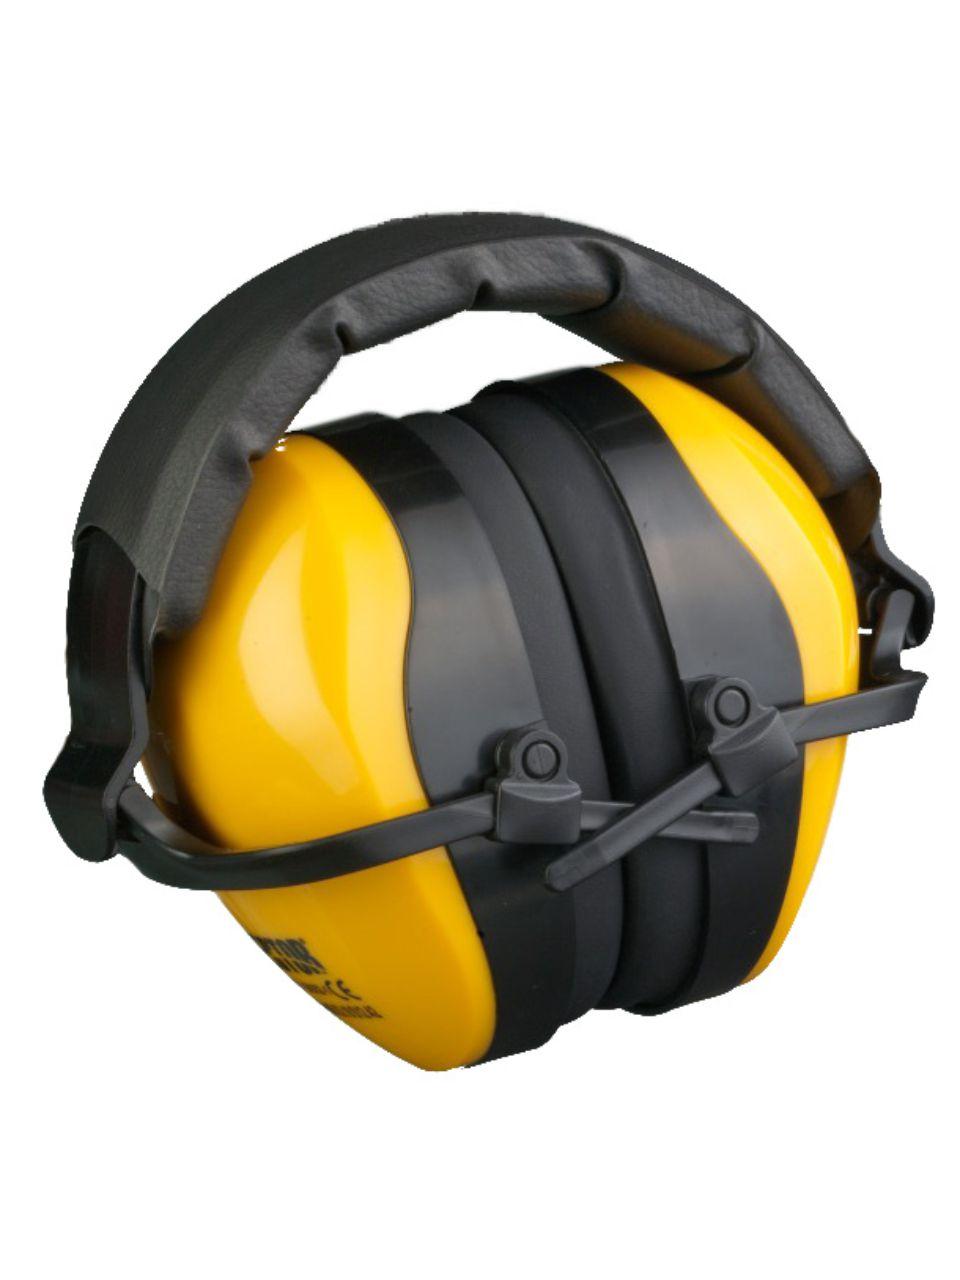 5 Stück Tector Gehörschützer Kapselgehörschutz Gehörschutz klappbar 29dB EN352-1